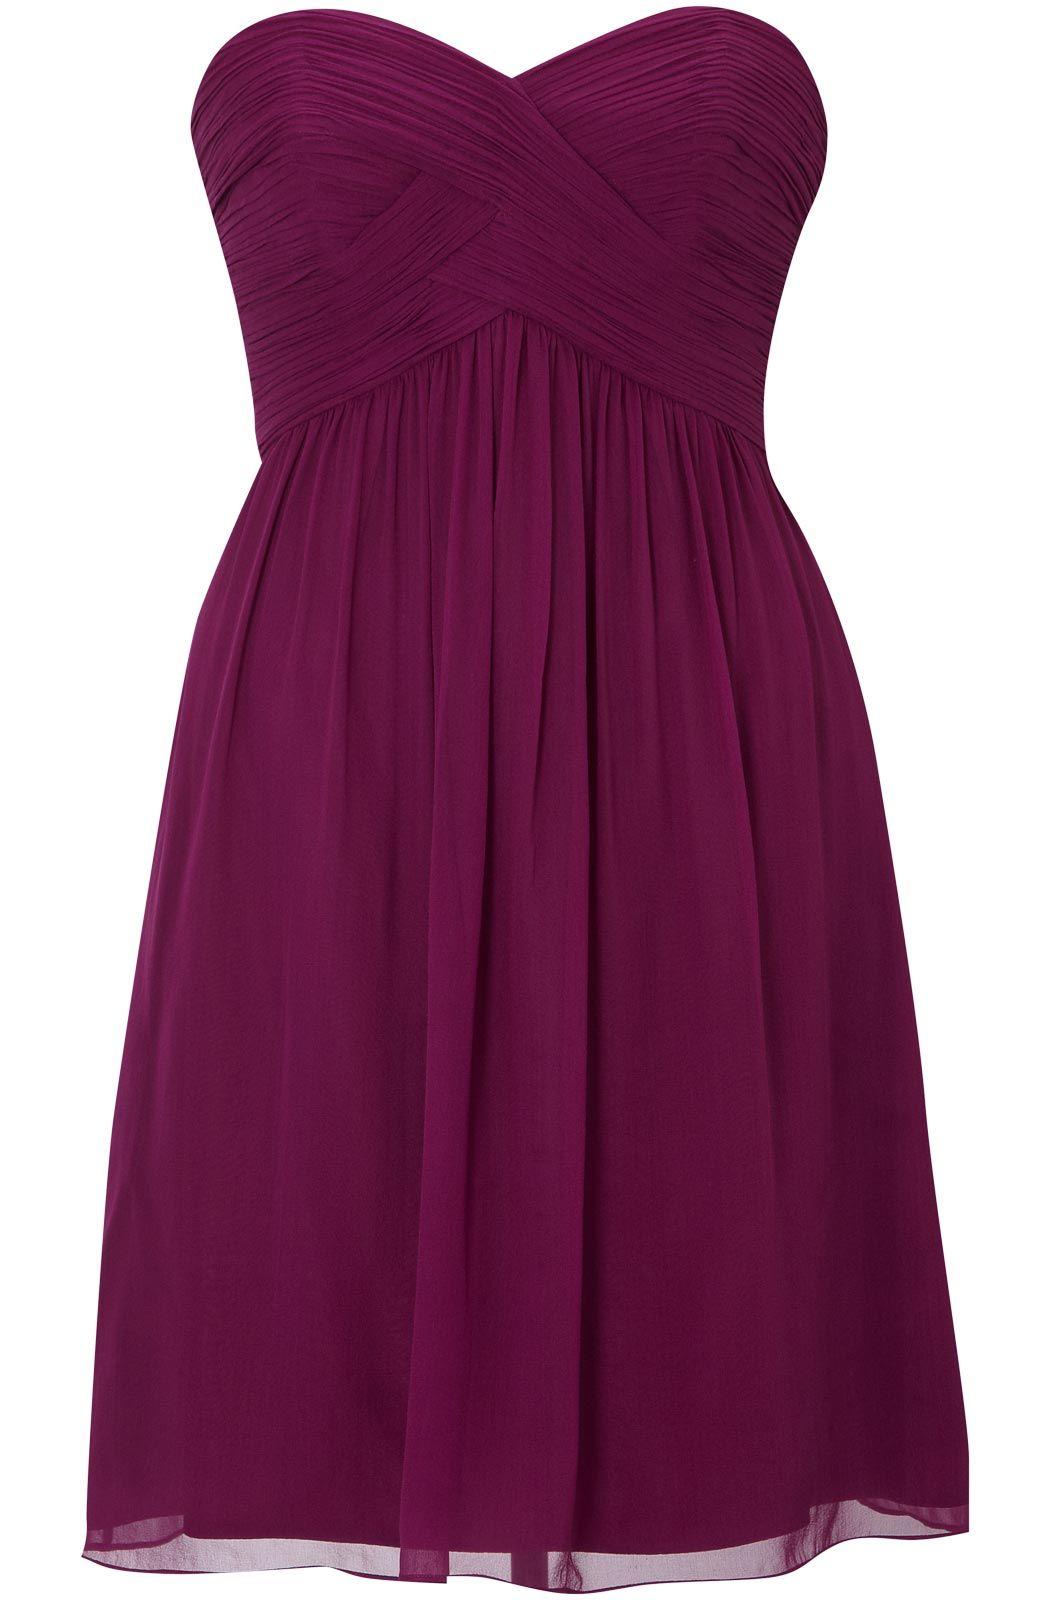 sangria bridesmaid dress. | Weddings | Pinterest | Vestidos dama ...